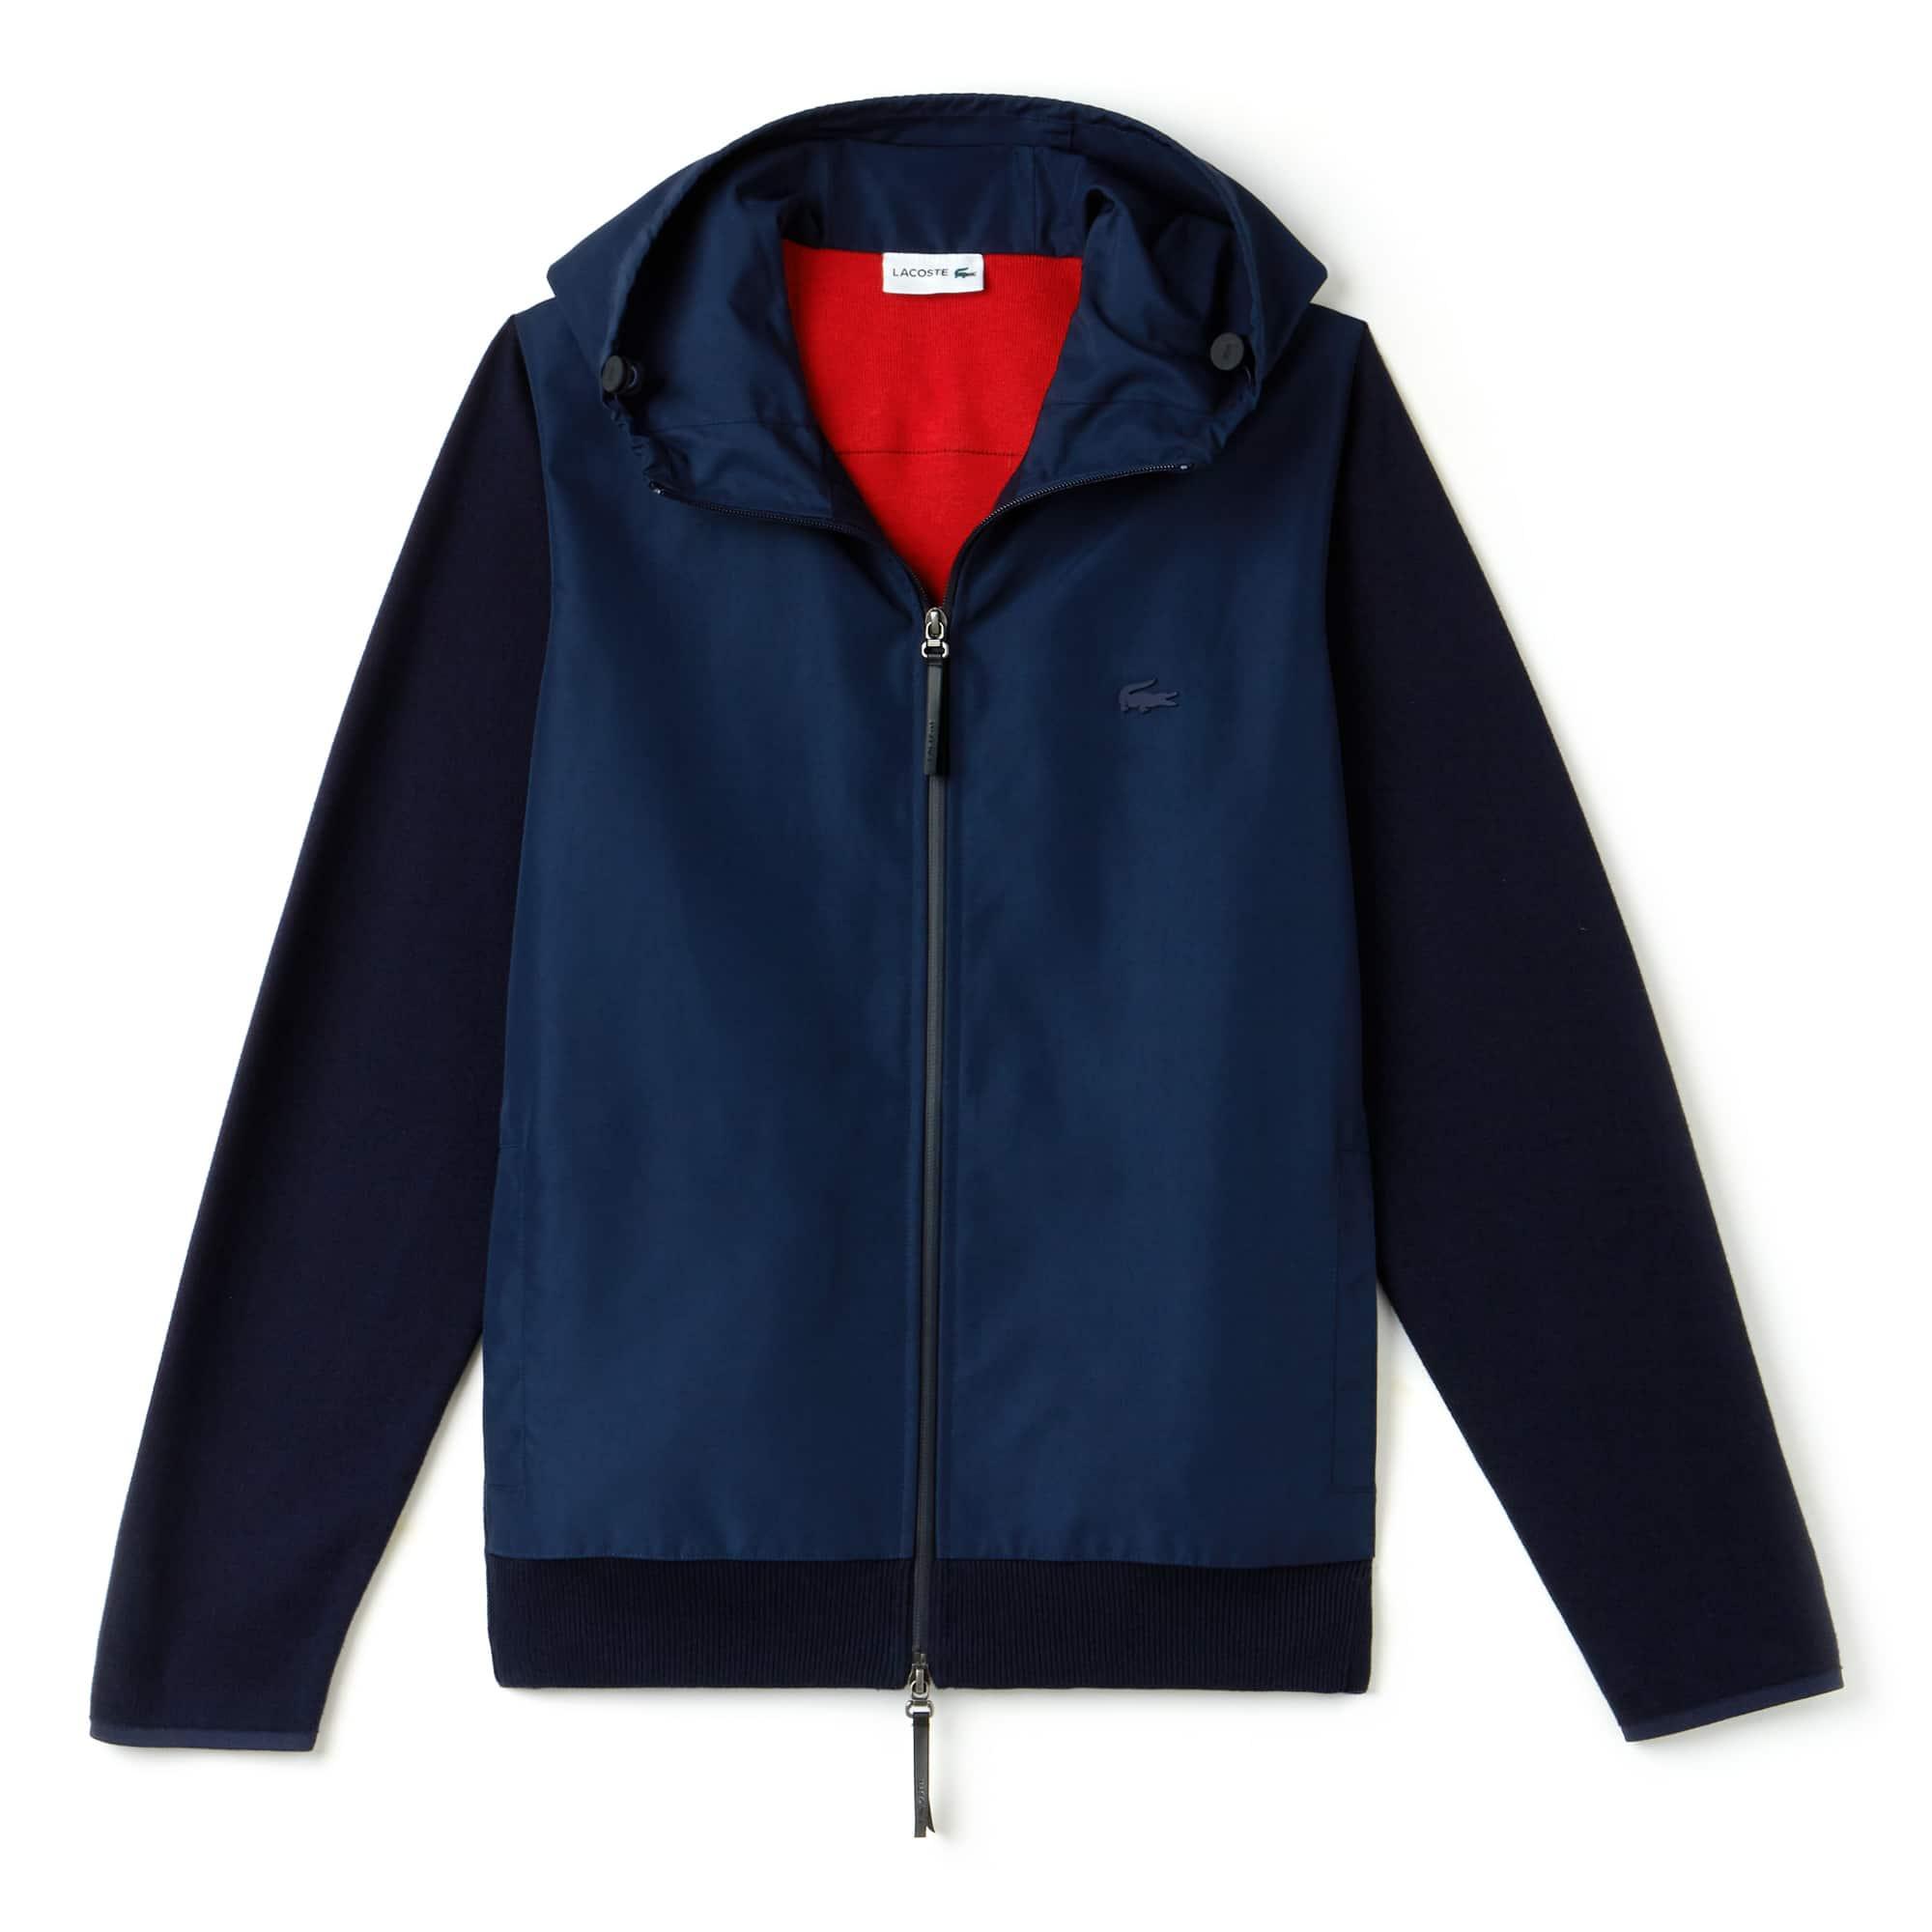 e3da6fcaa Men s Clothing on Sale